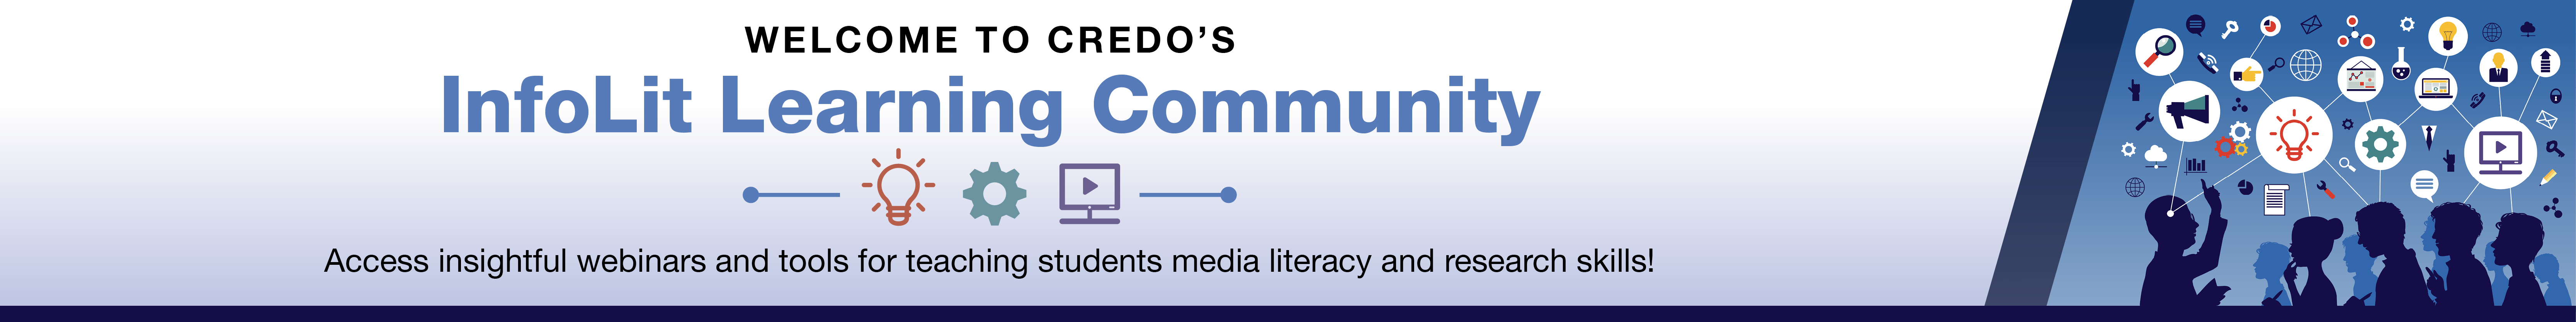 InfoLitLearningCommunity_LandingPageHeader_1600x200